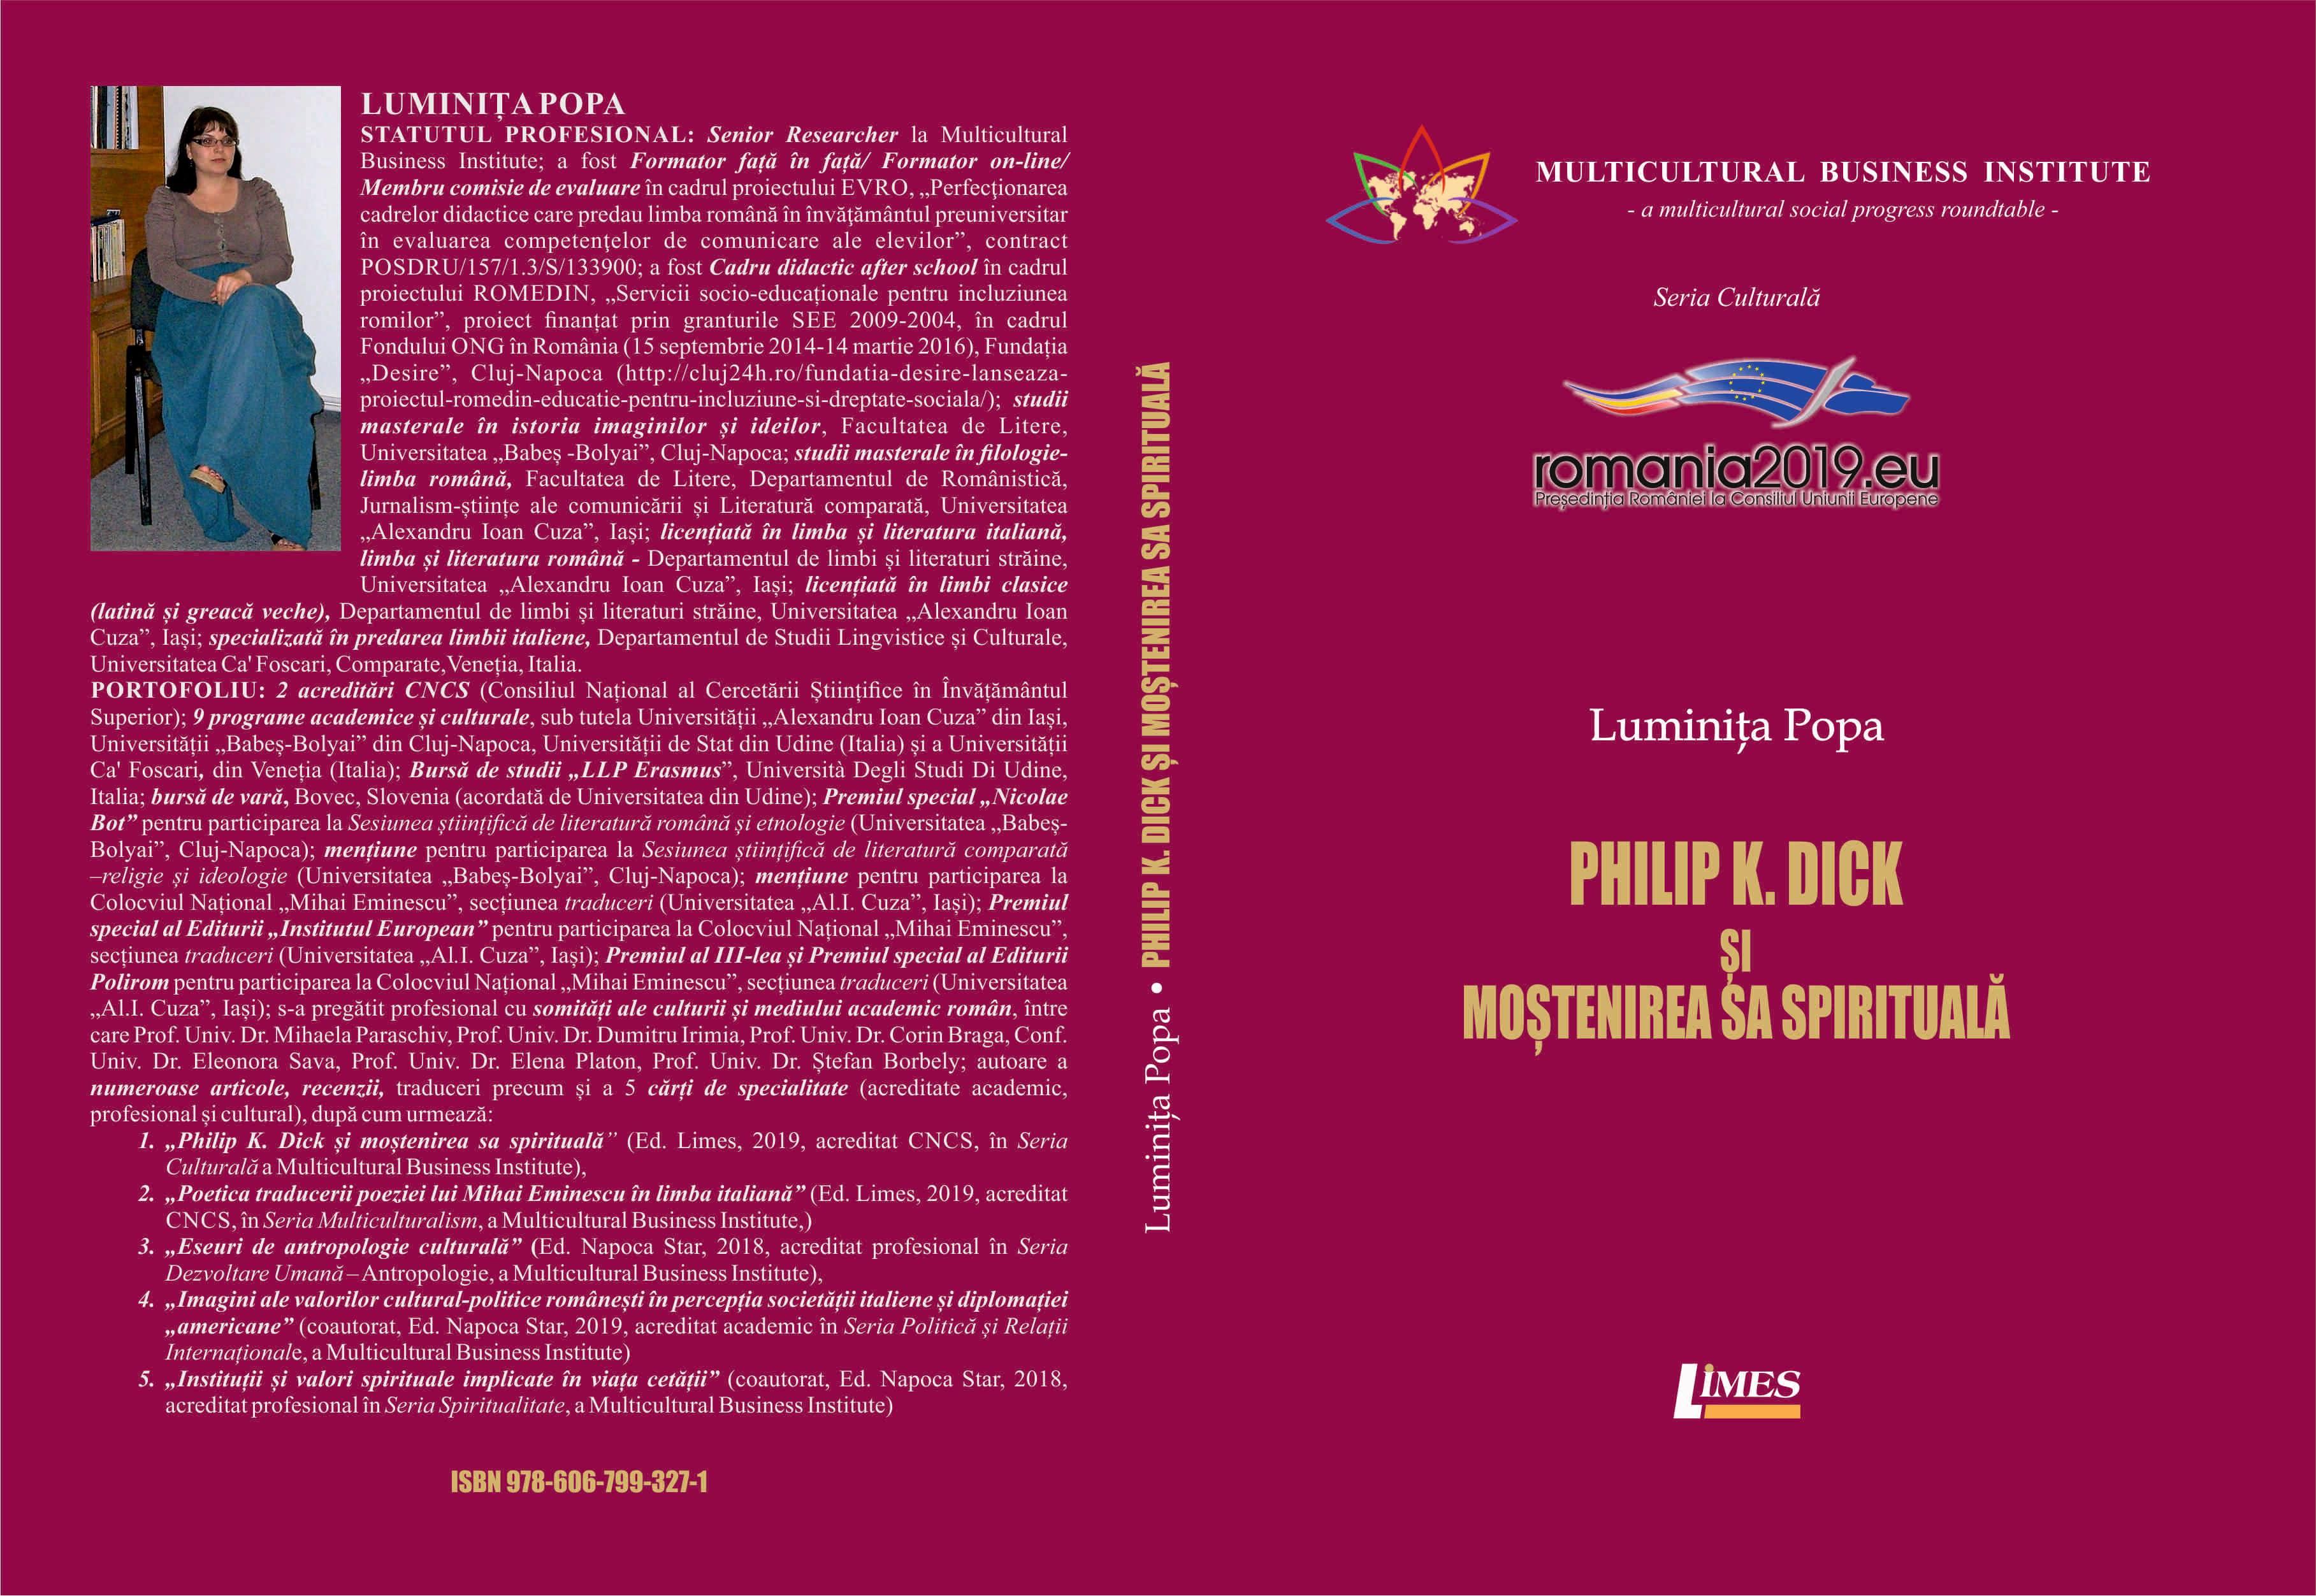 Phillip Dick - Luminita Popa